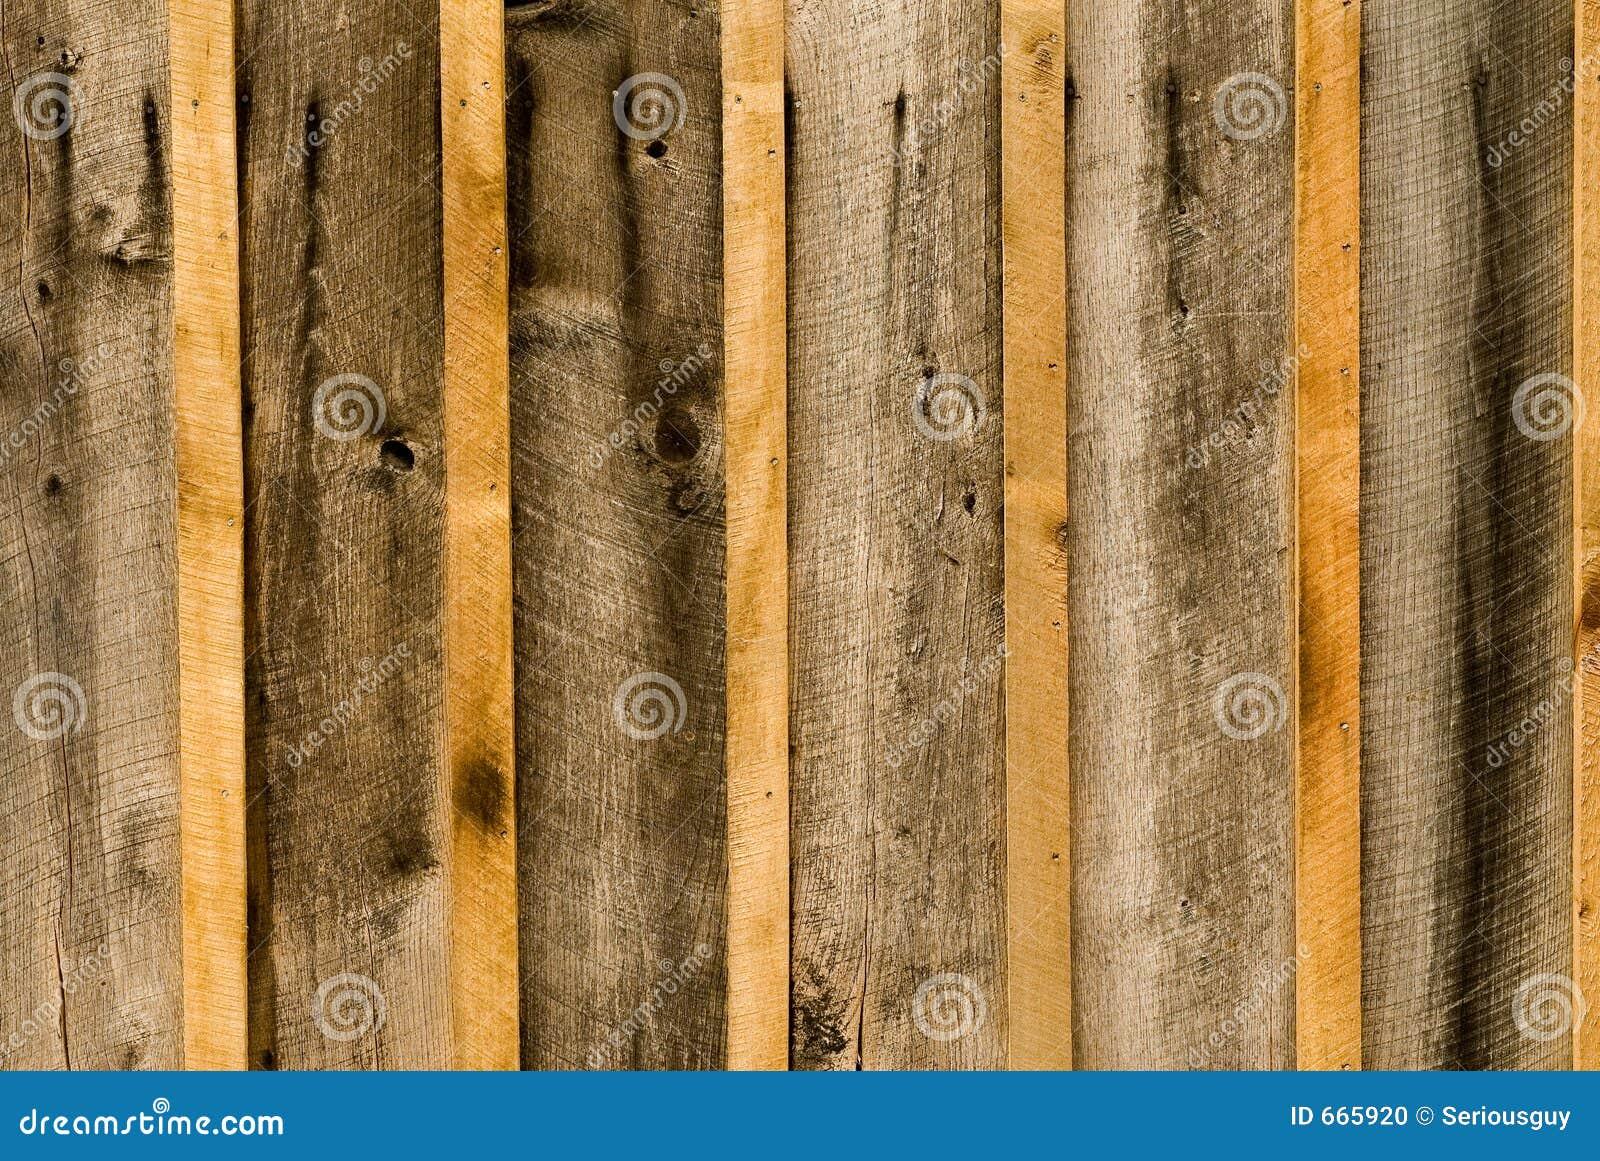 Close Up Rough Wood Siding 665920 Jpg